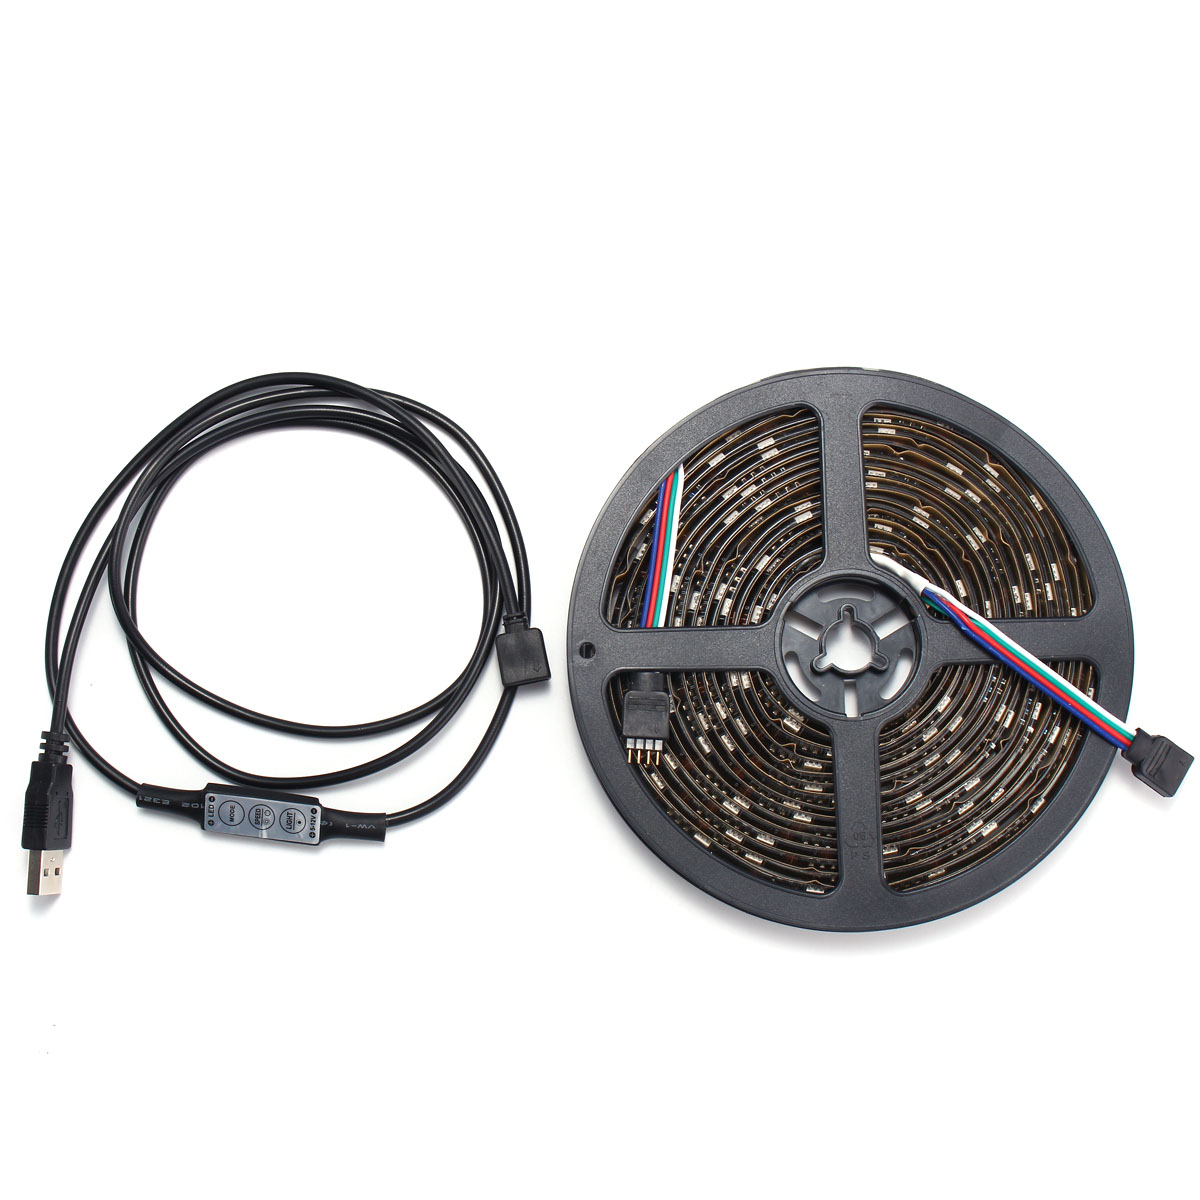 0.5/1/2/3/4/5M USB Waterproof RGB SMD5050 LED Strip Light Bar TV Background Lighting Lamp Kit DC5V